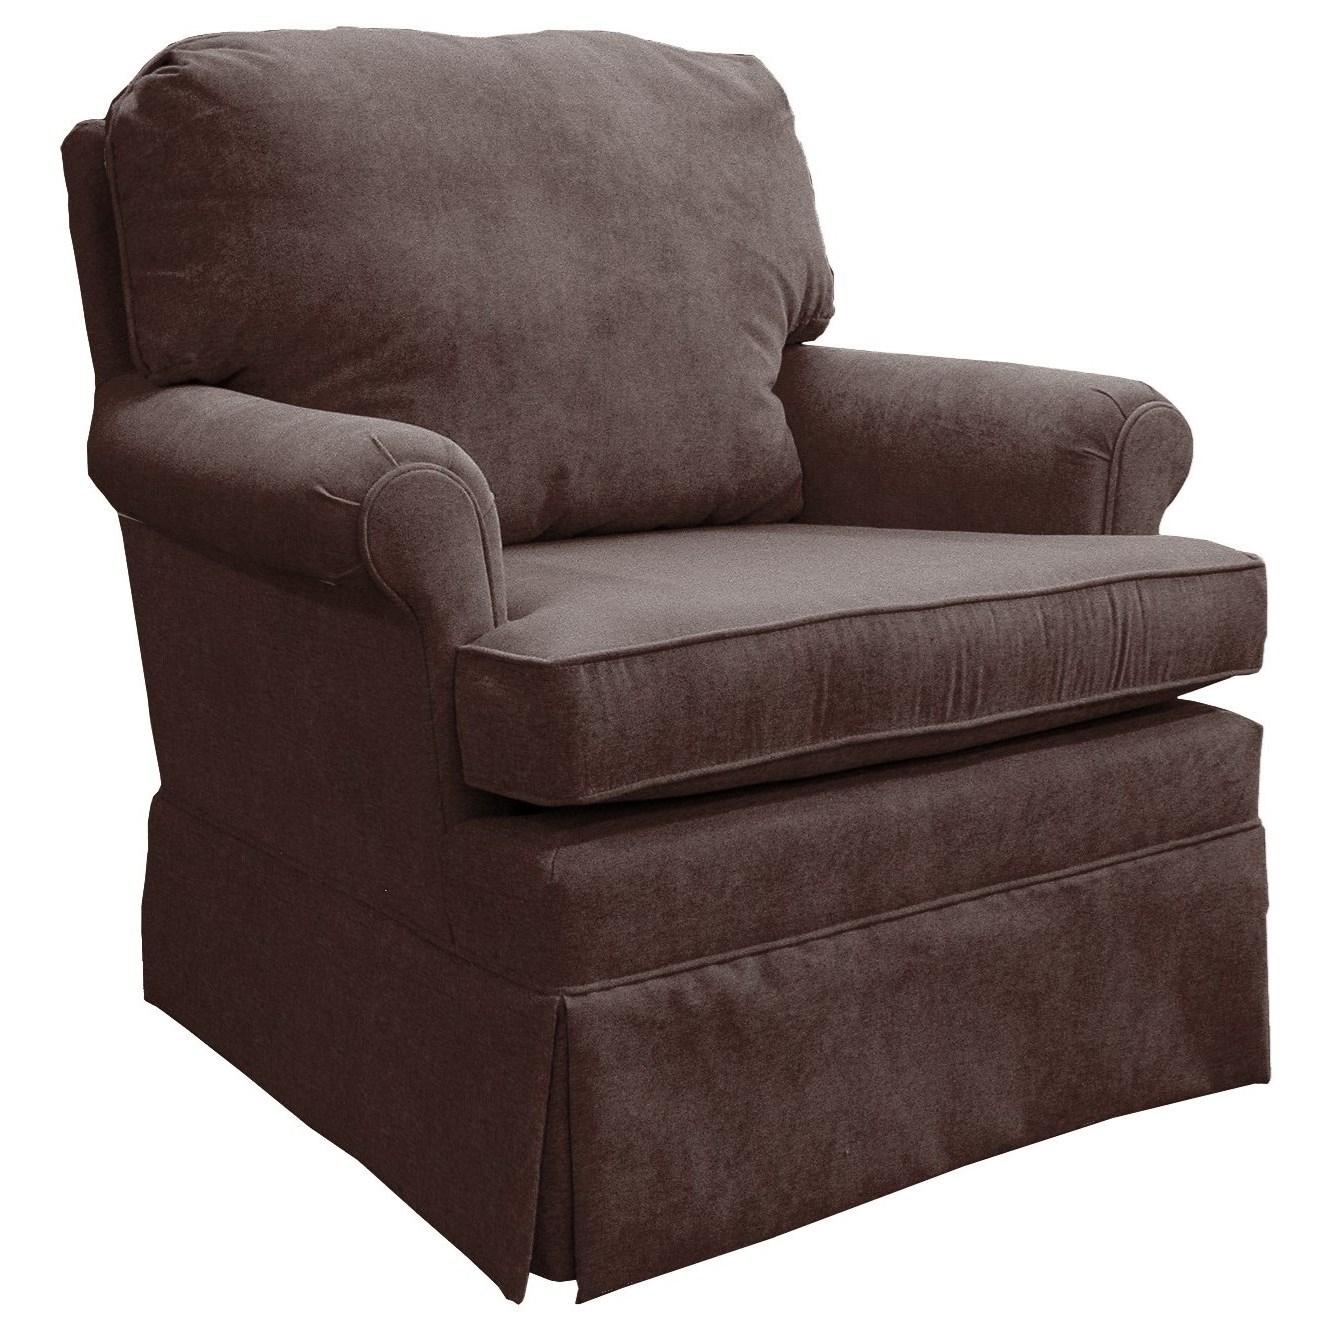 Best Home Furnishings Patoka Swivel Glider Club Chair  - Item Number: 2617-23168C